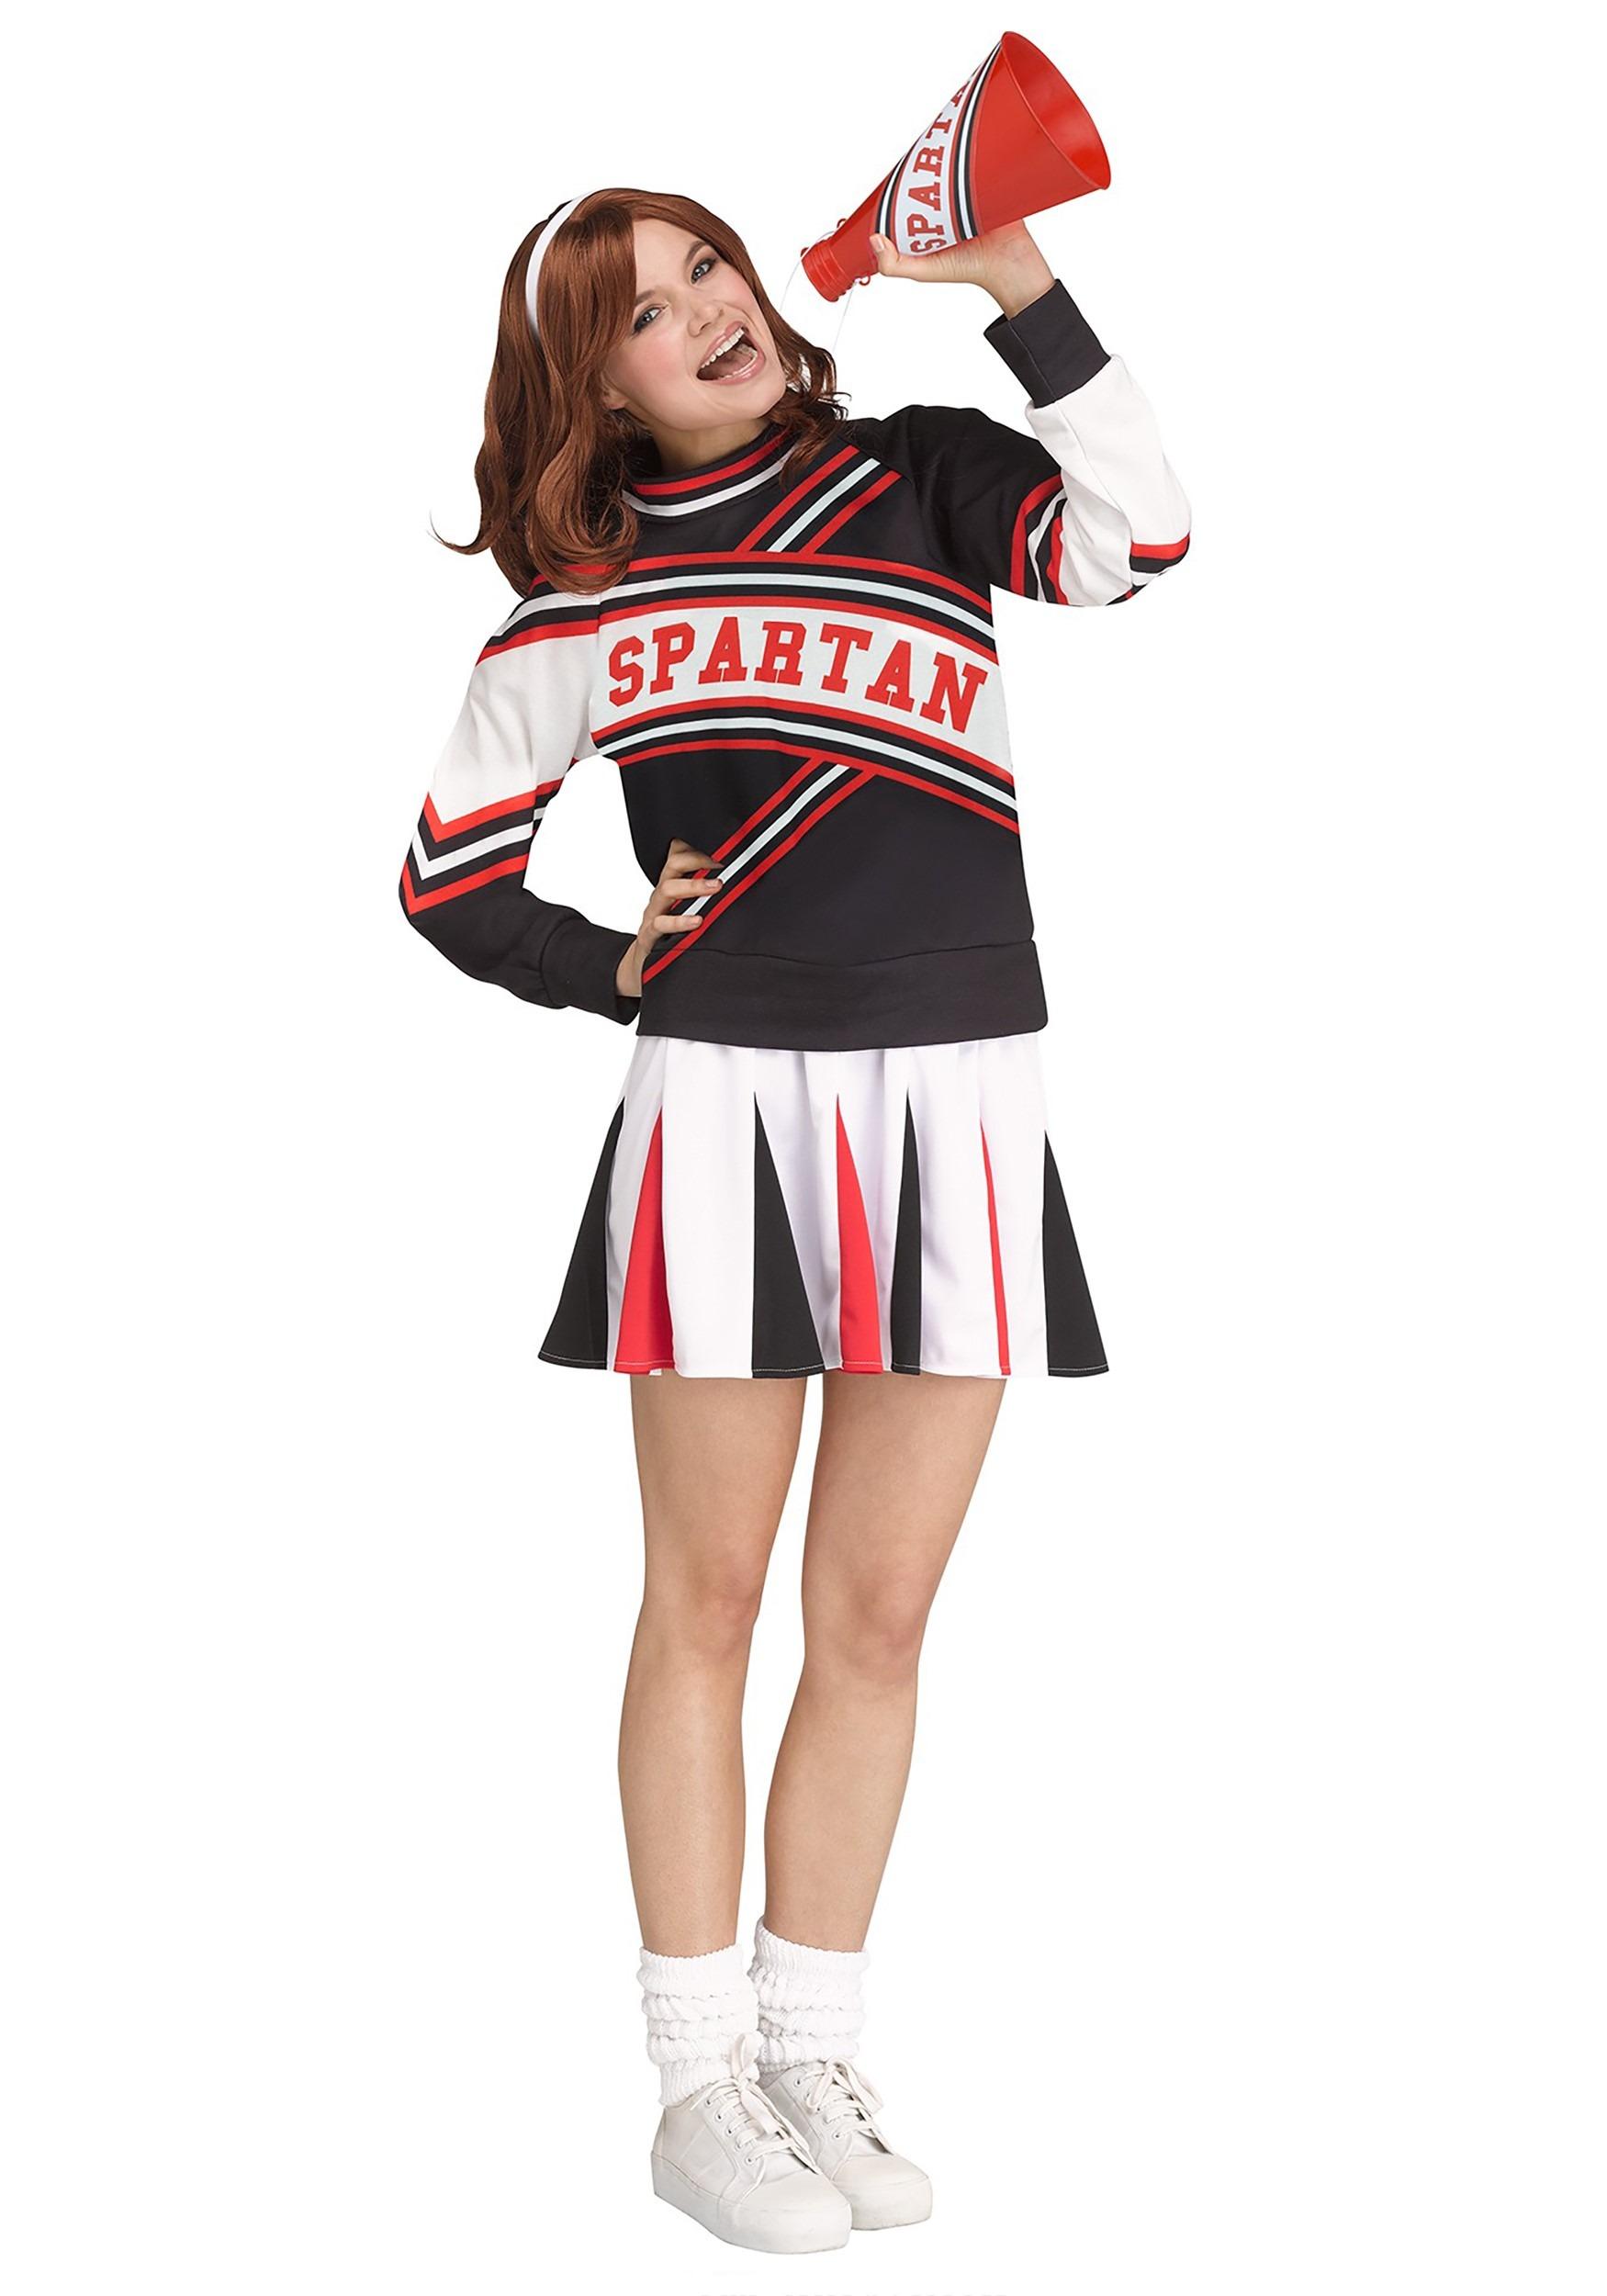 Spartan Cheerleader Mens Adult Saturday Night Live Halloween Costume